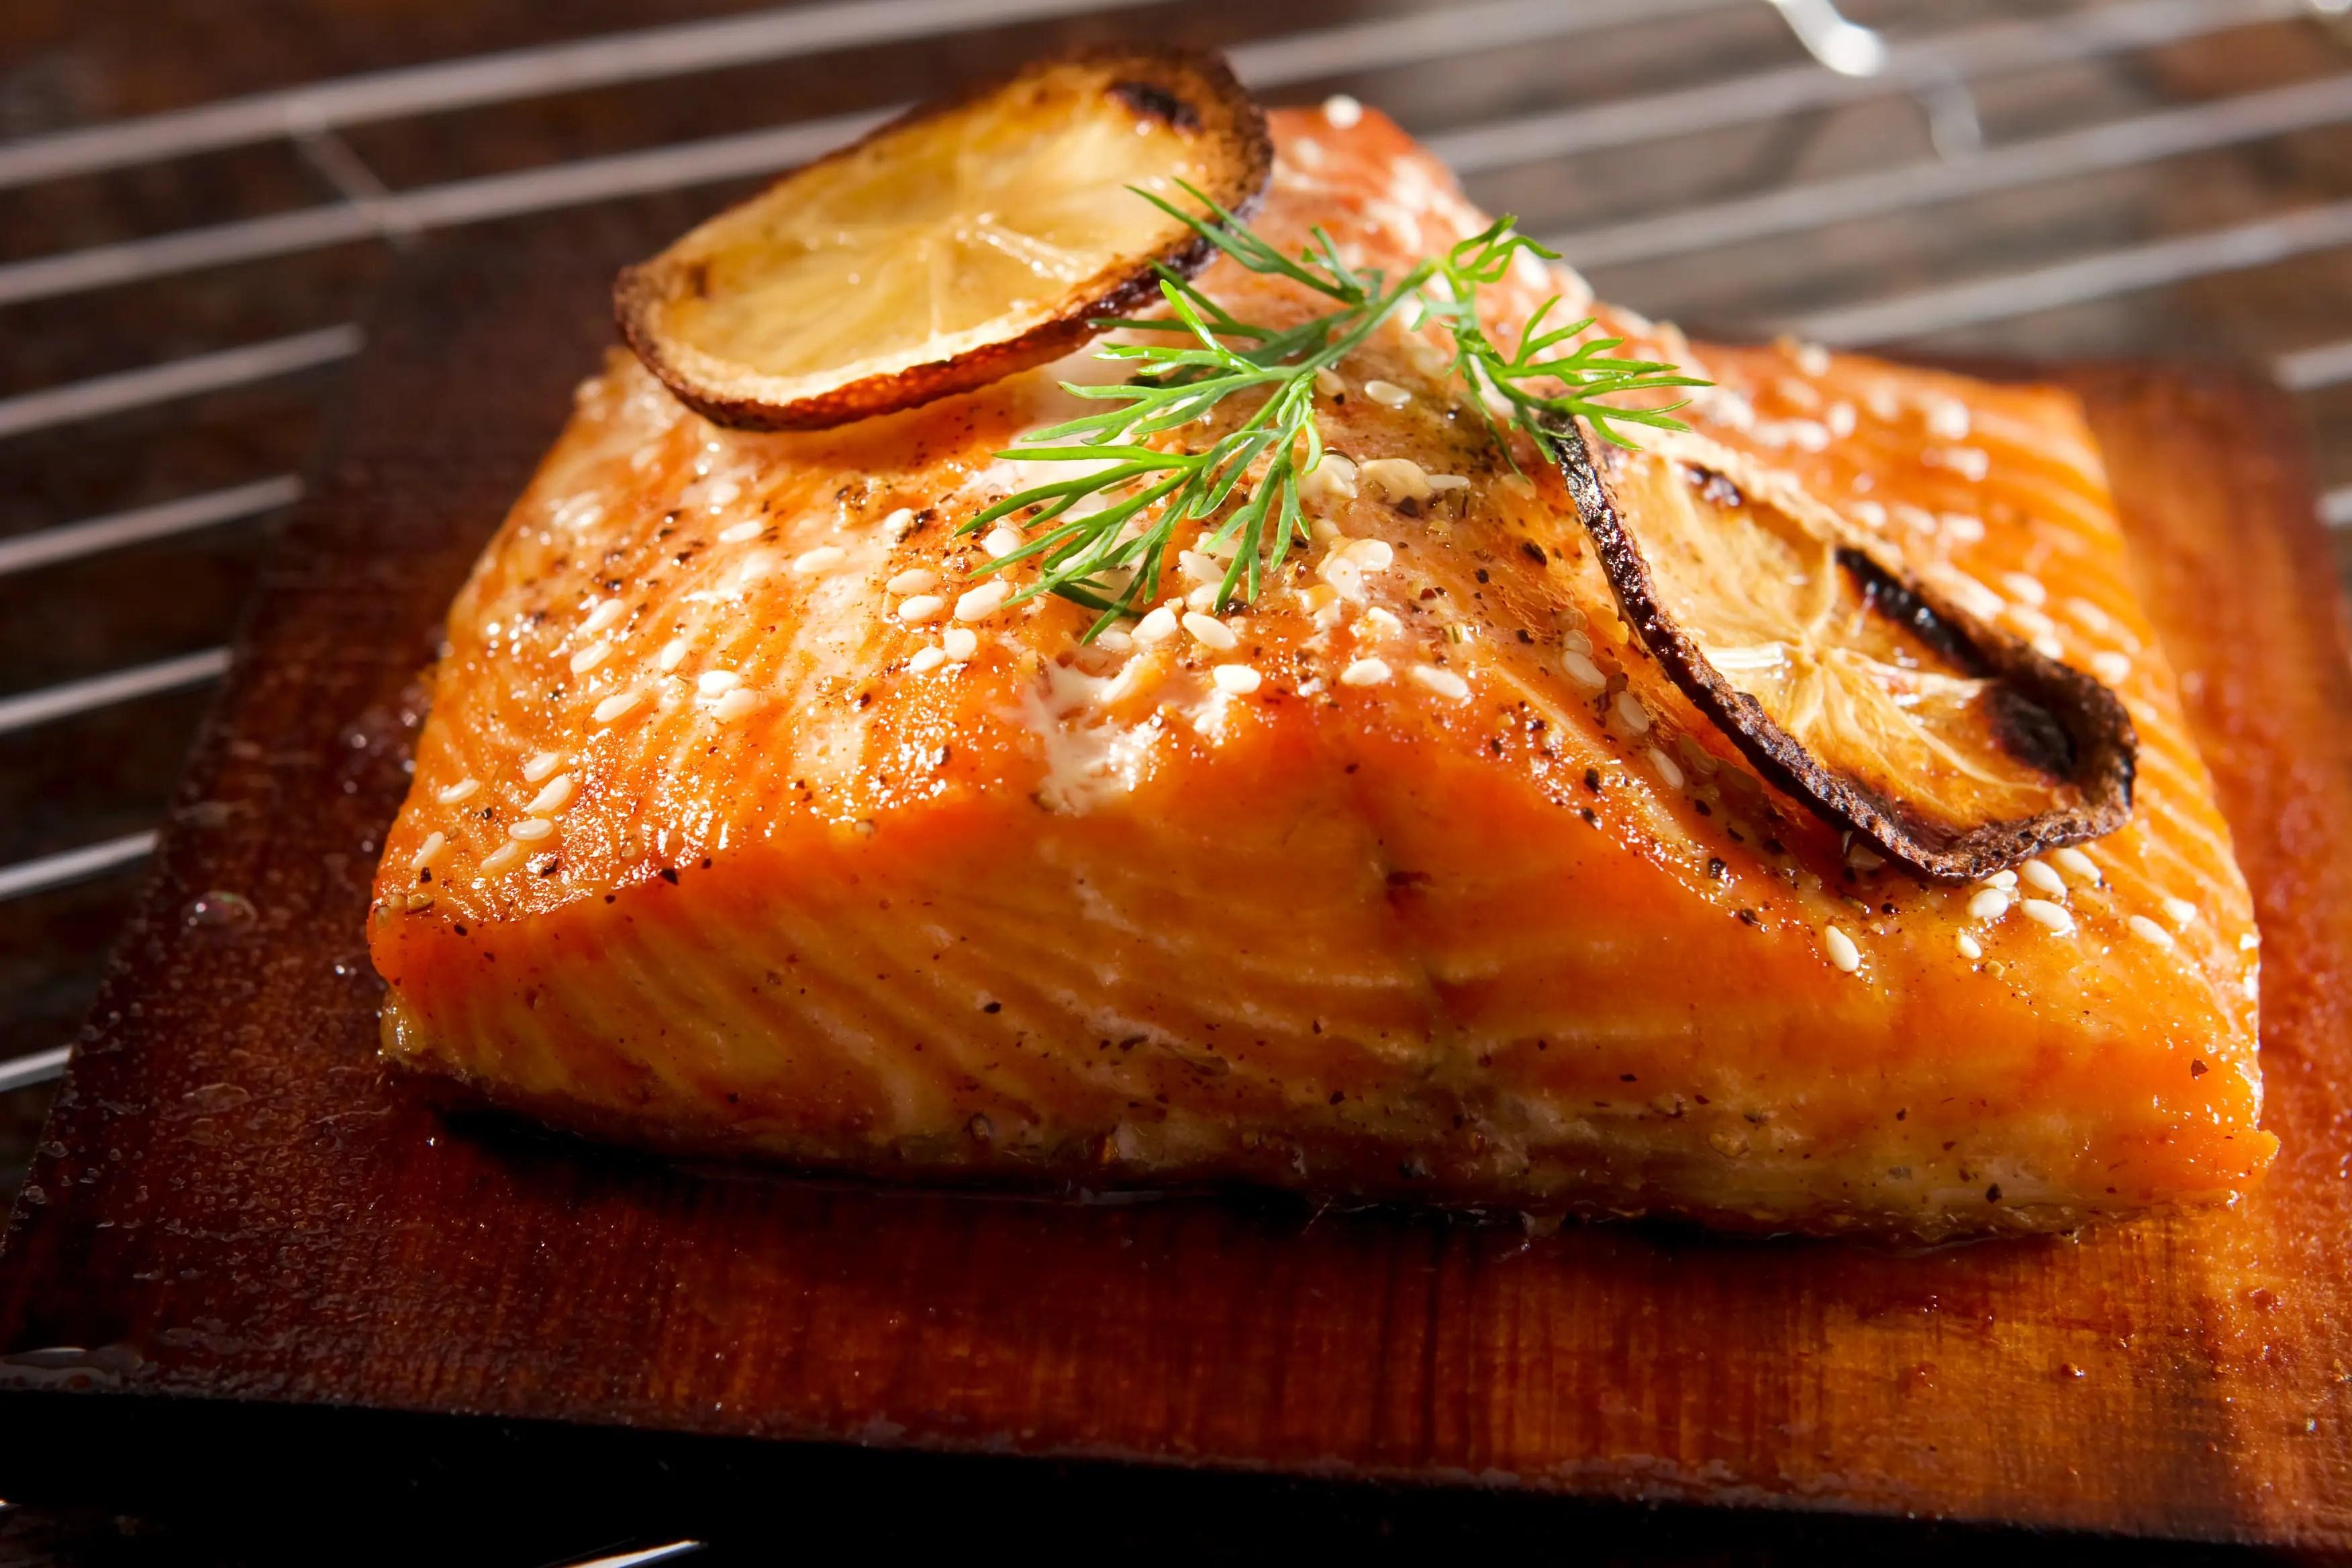 Instead of steak or ribs: Fatty fish